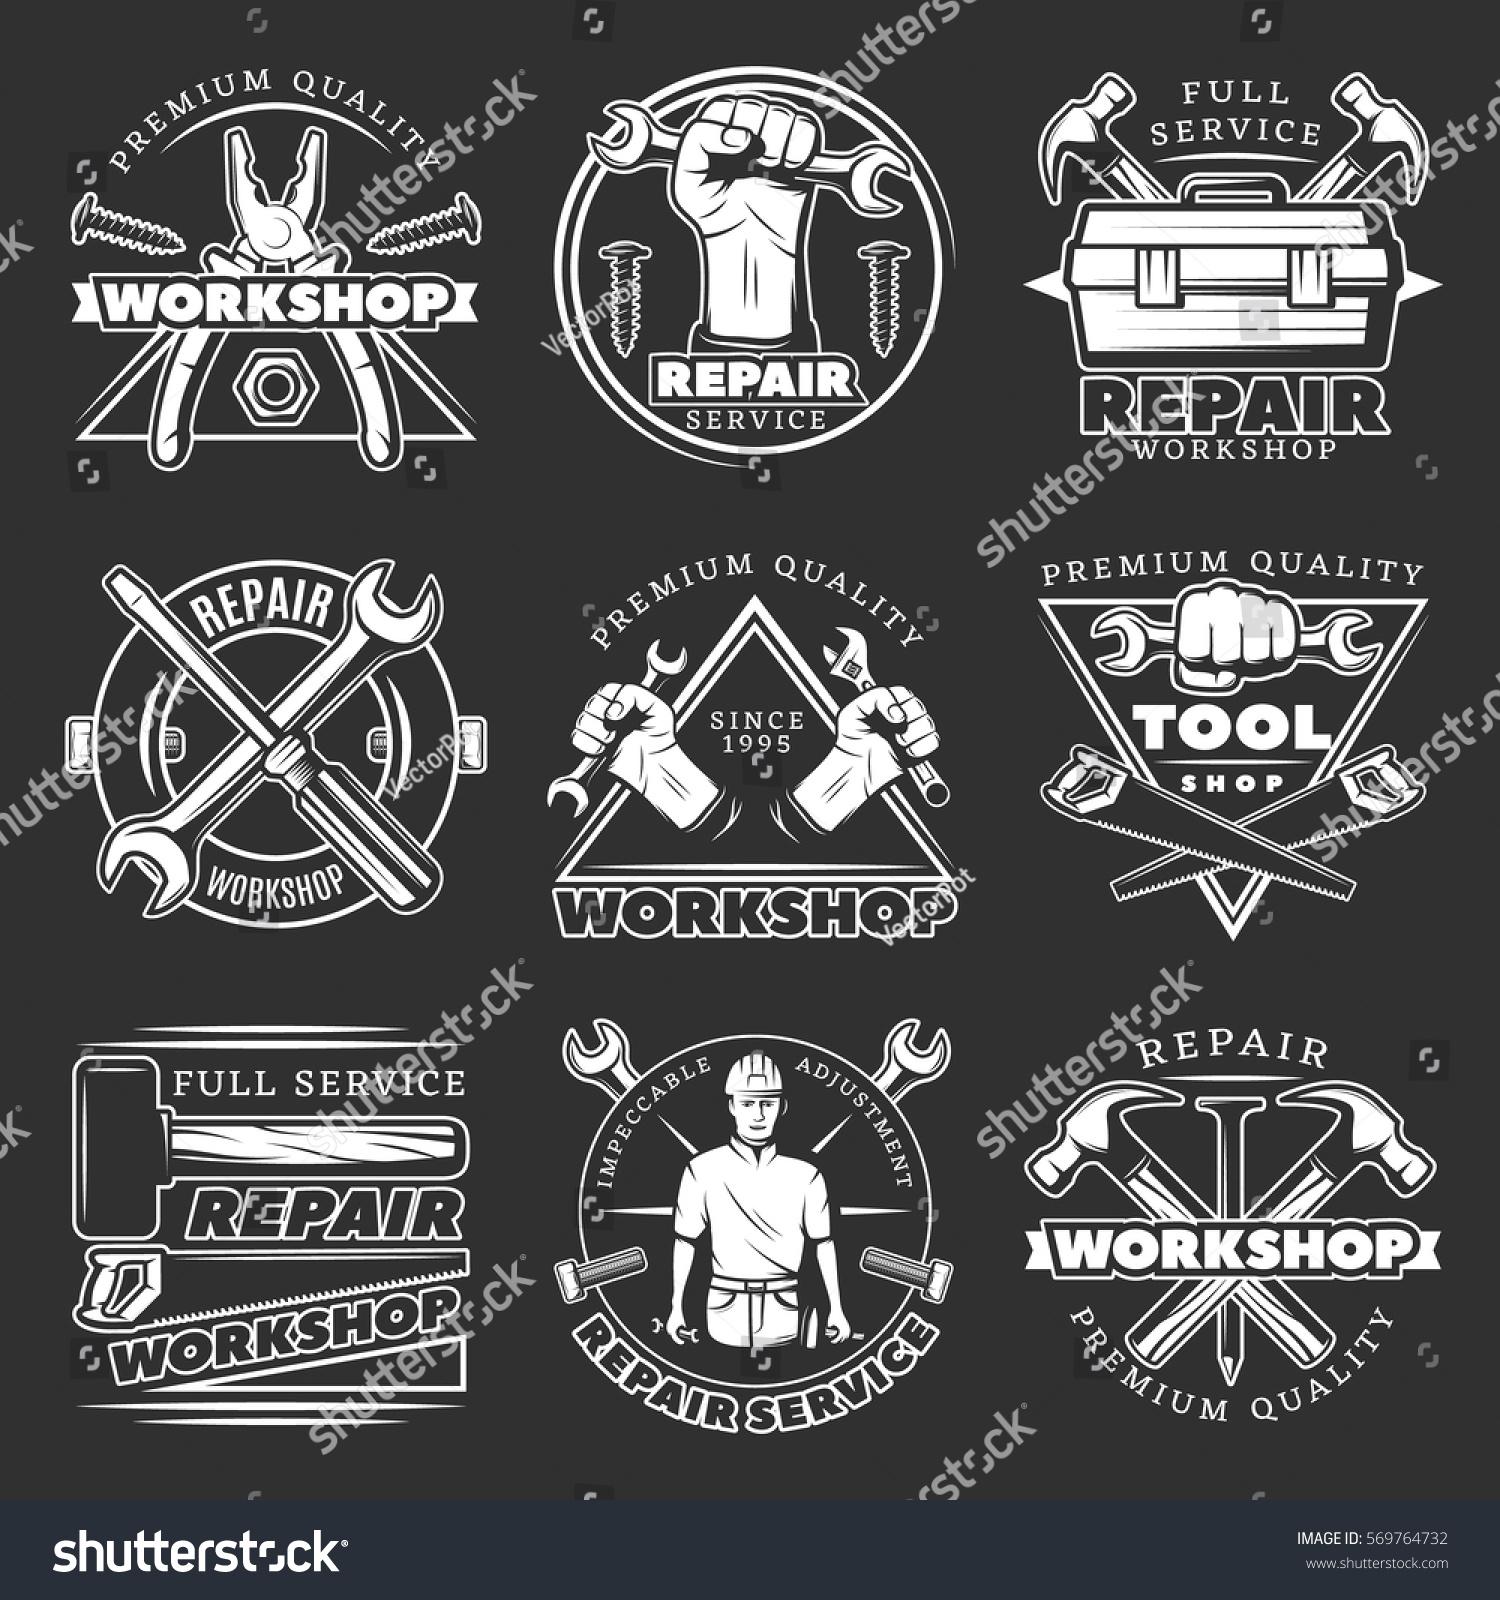 White Isolated Vintage Repair Workshop Logo Stock Vector 569764732